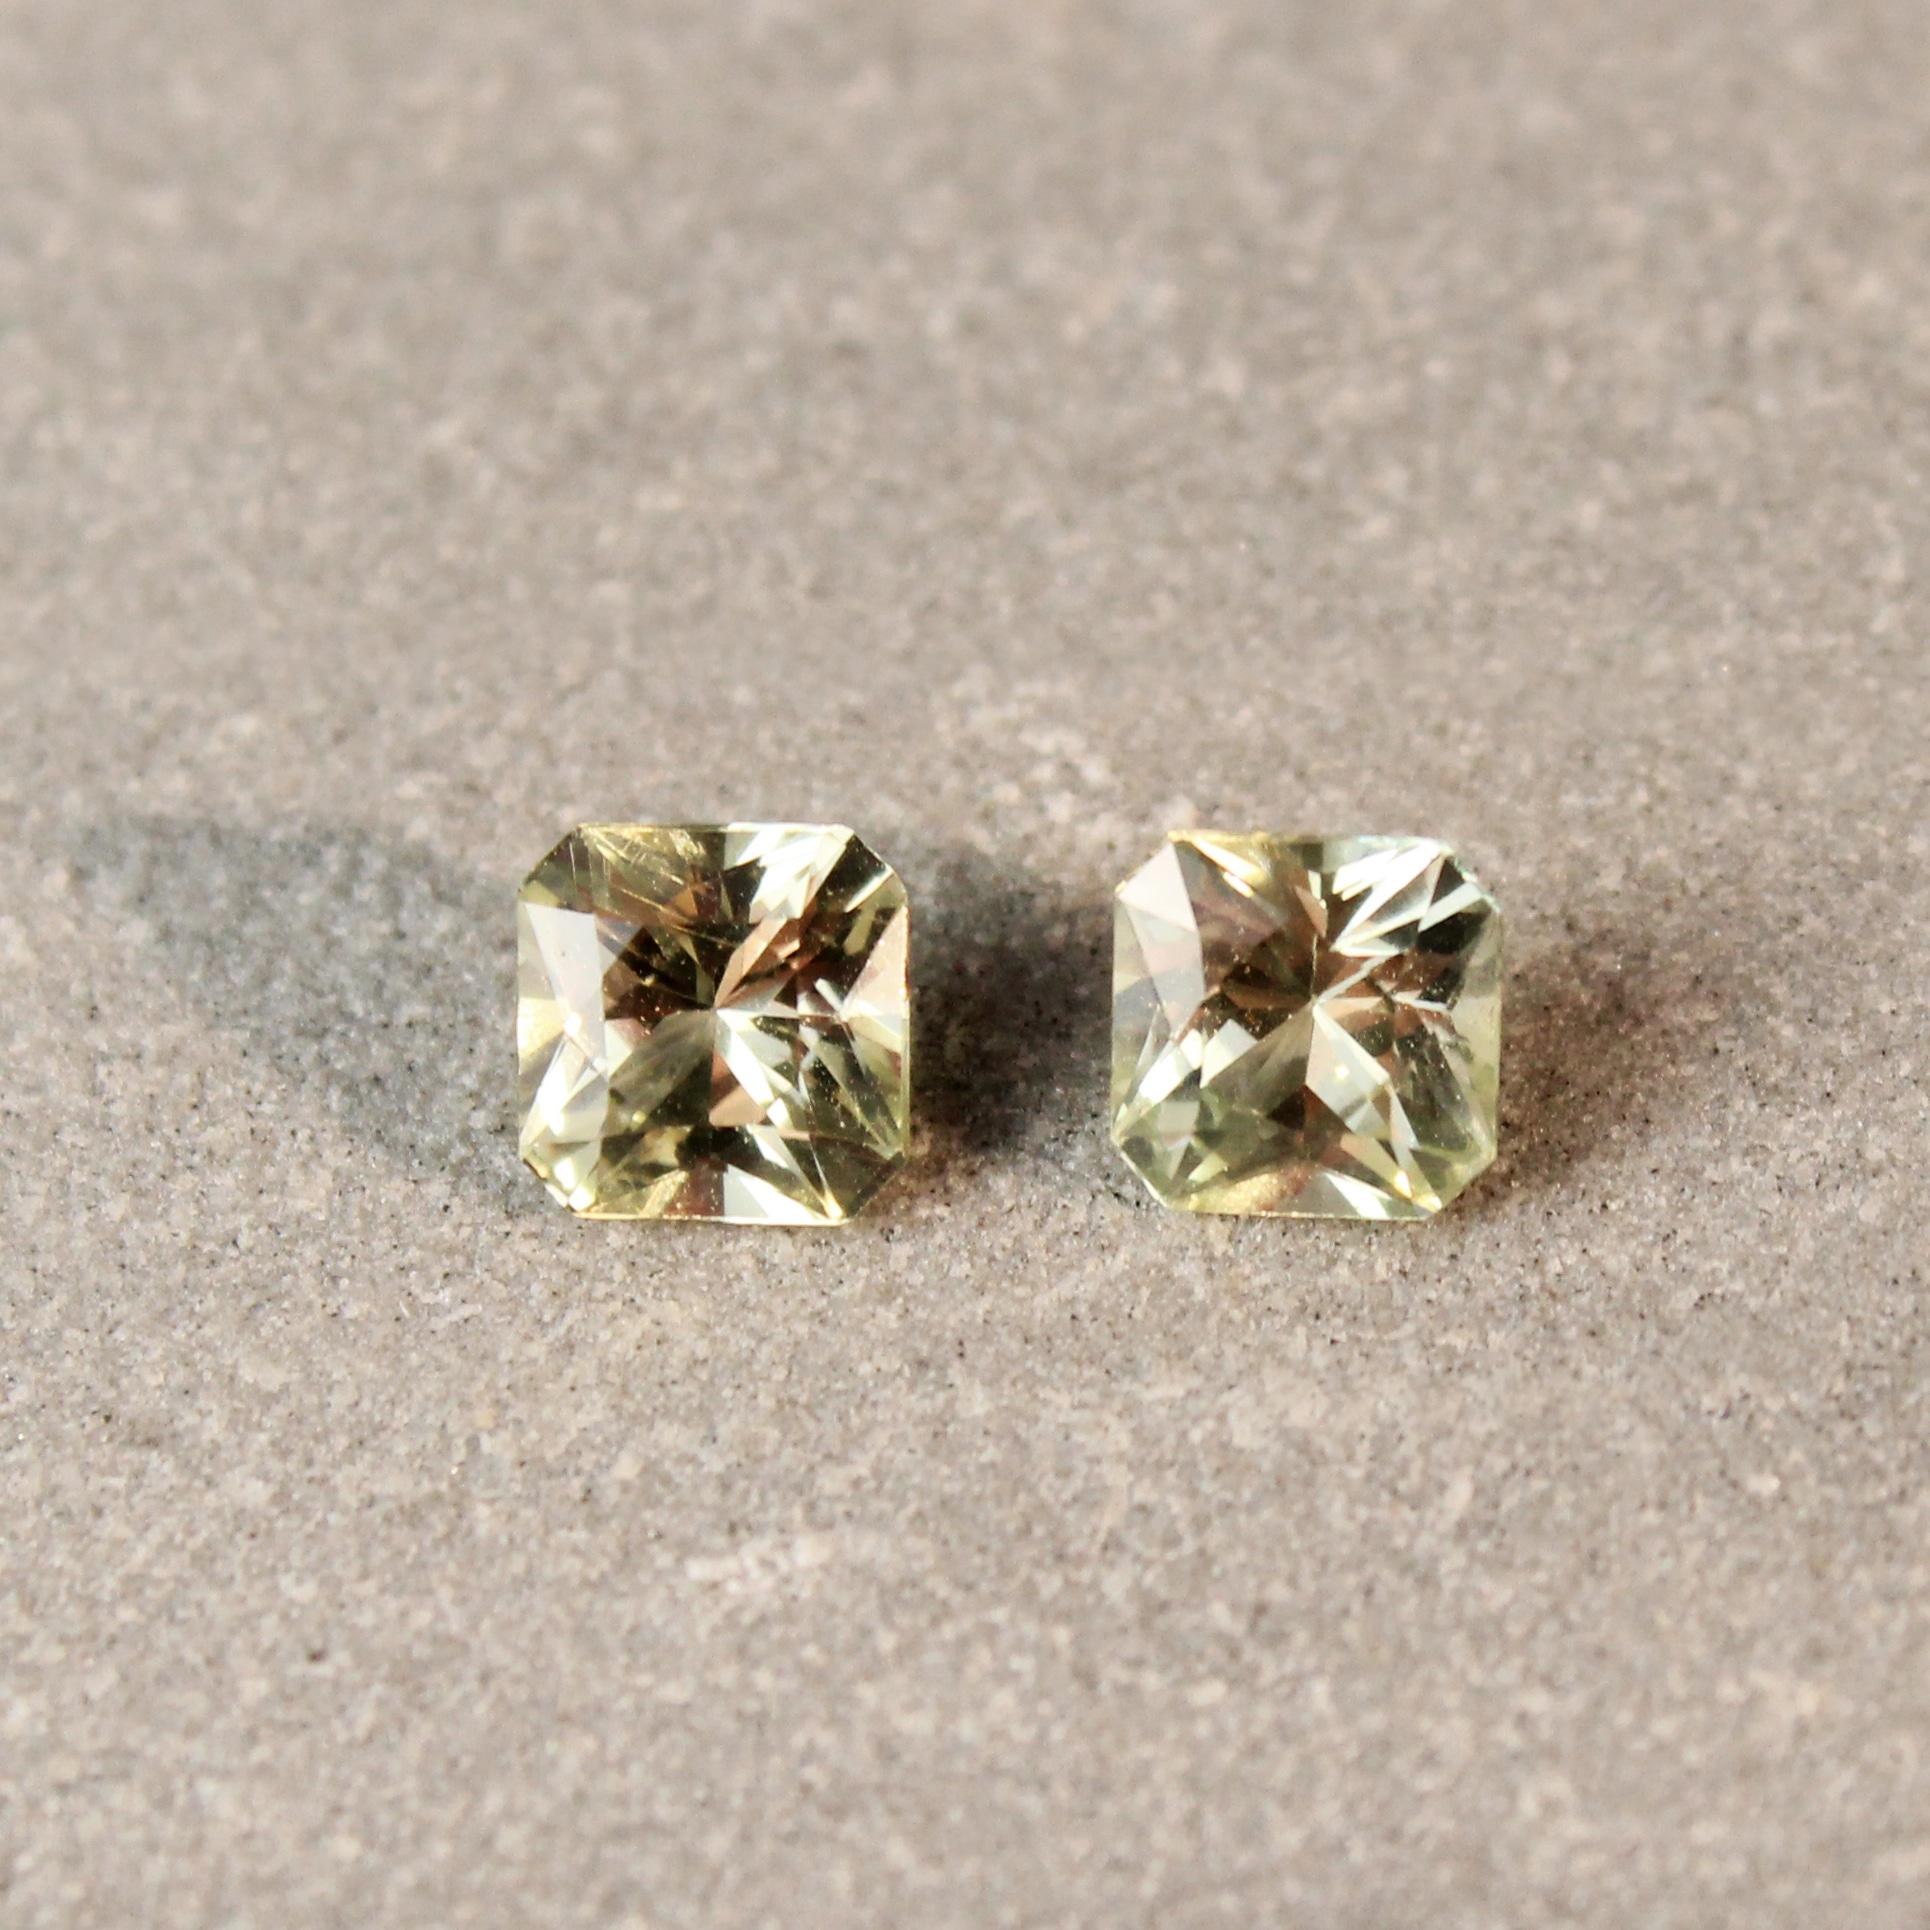 1.46 ct yellow radiant sapphire pair